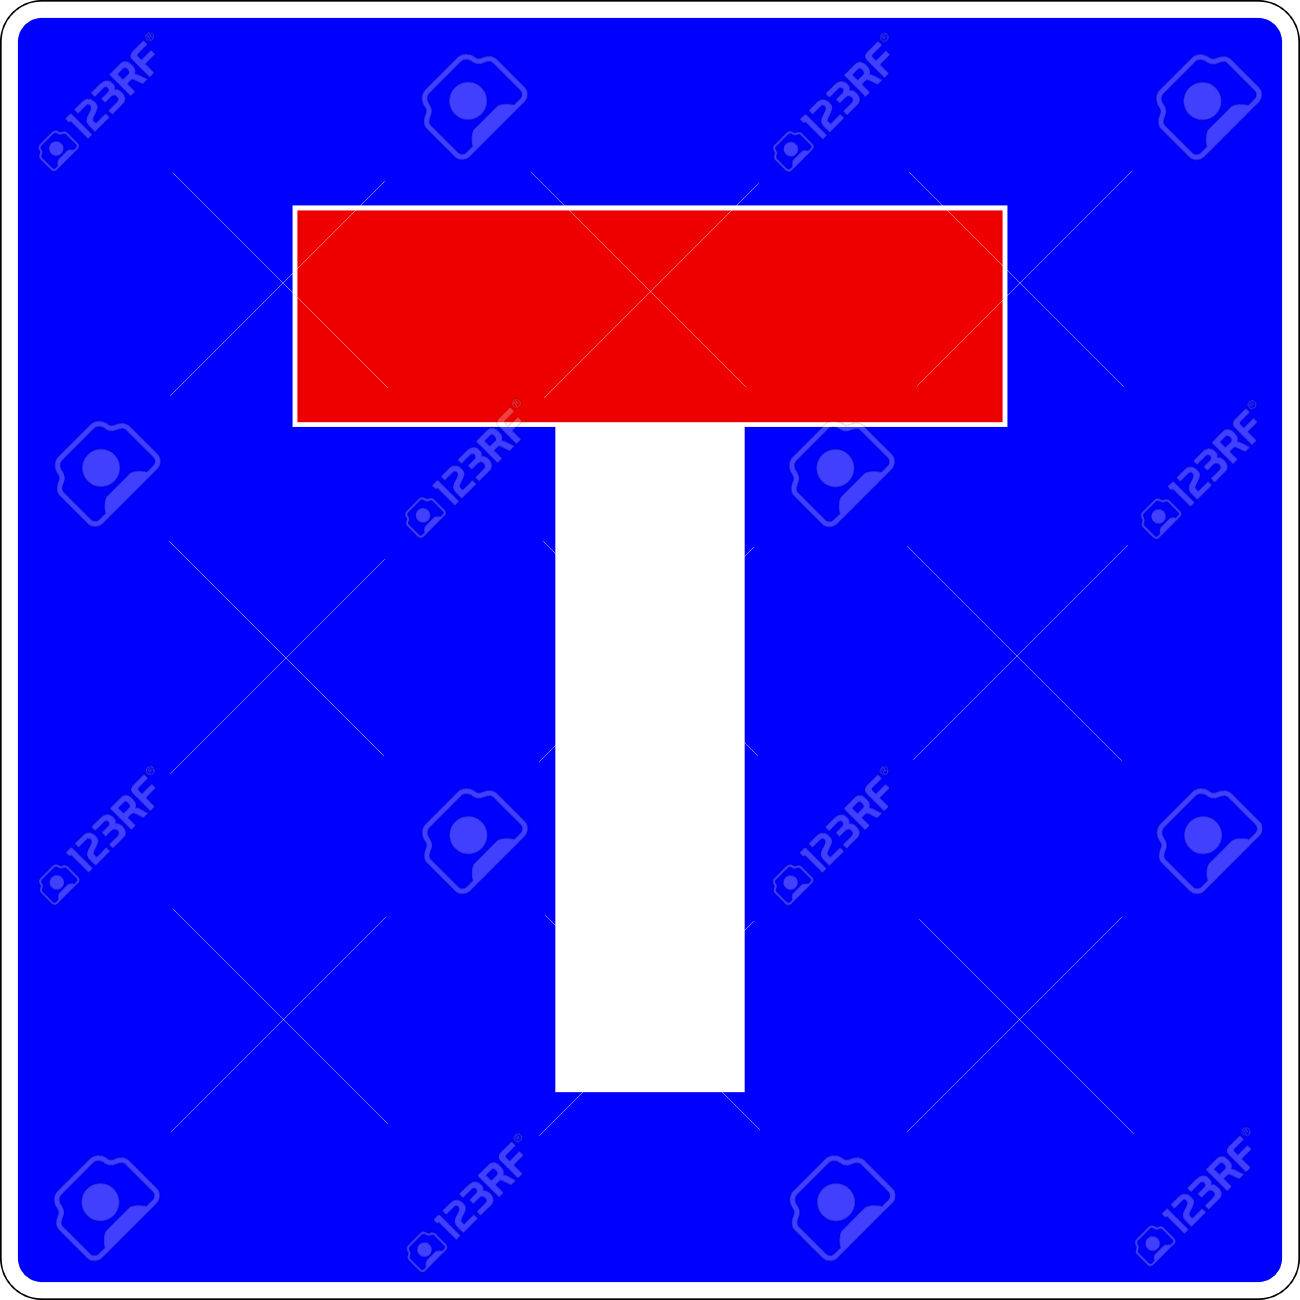 Dead End Traffic Sign Vector eps10 Stock Vector - 27029800